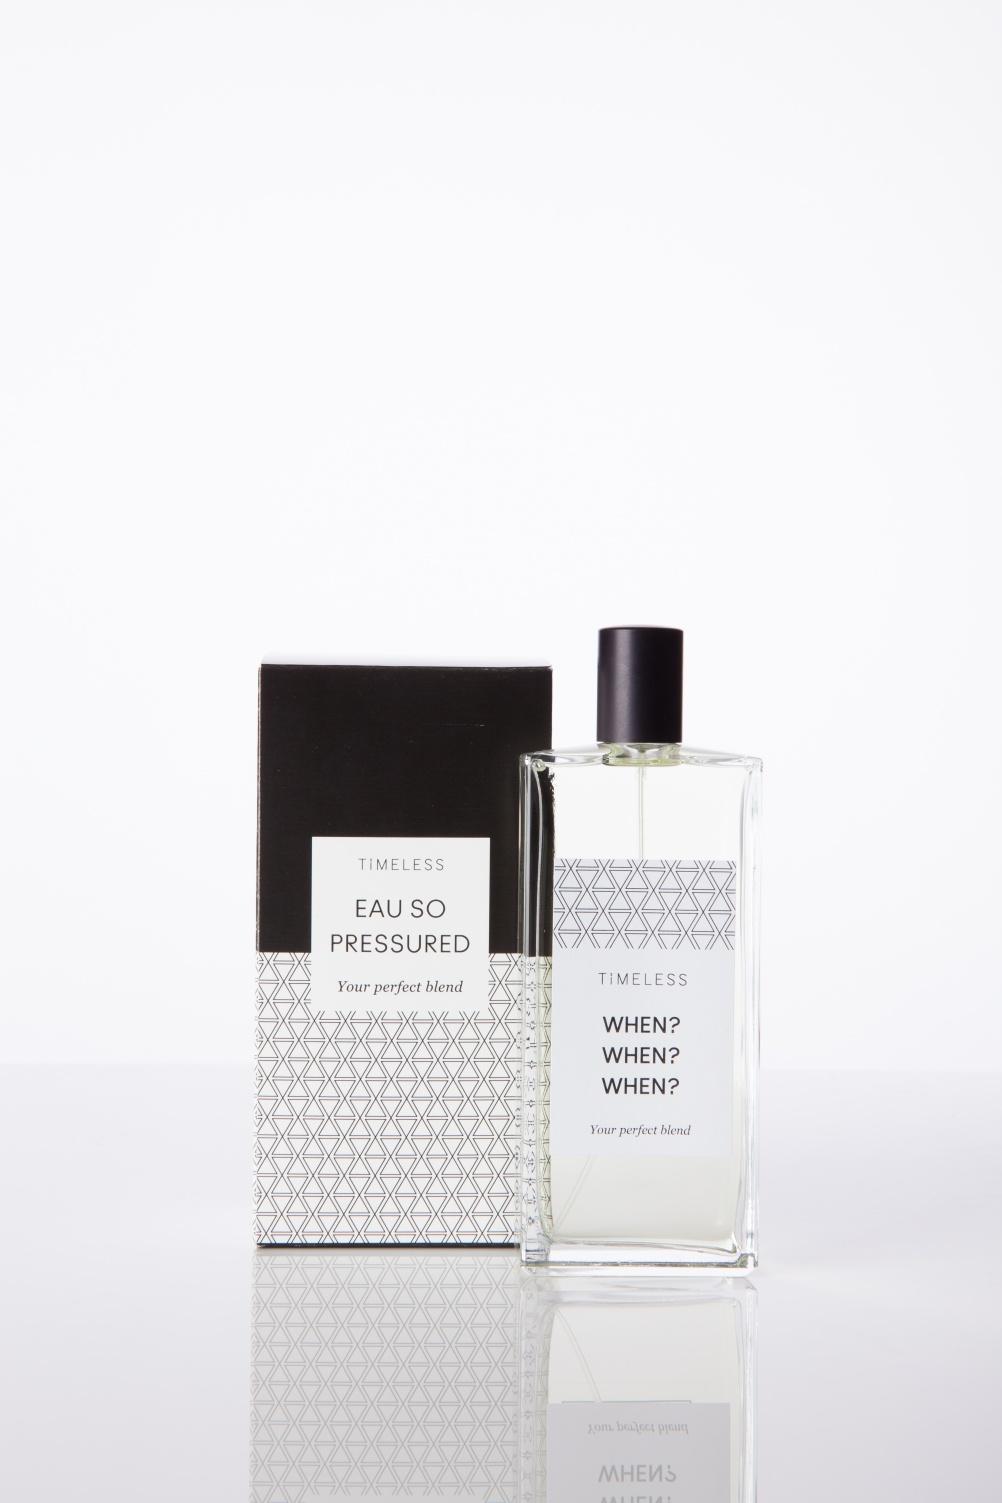 6 Timeless Perfume 1